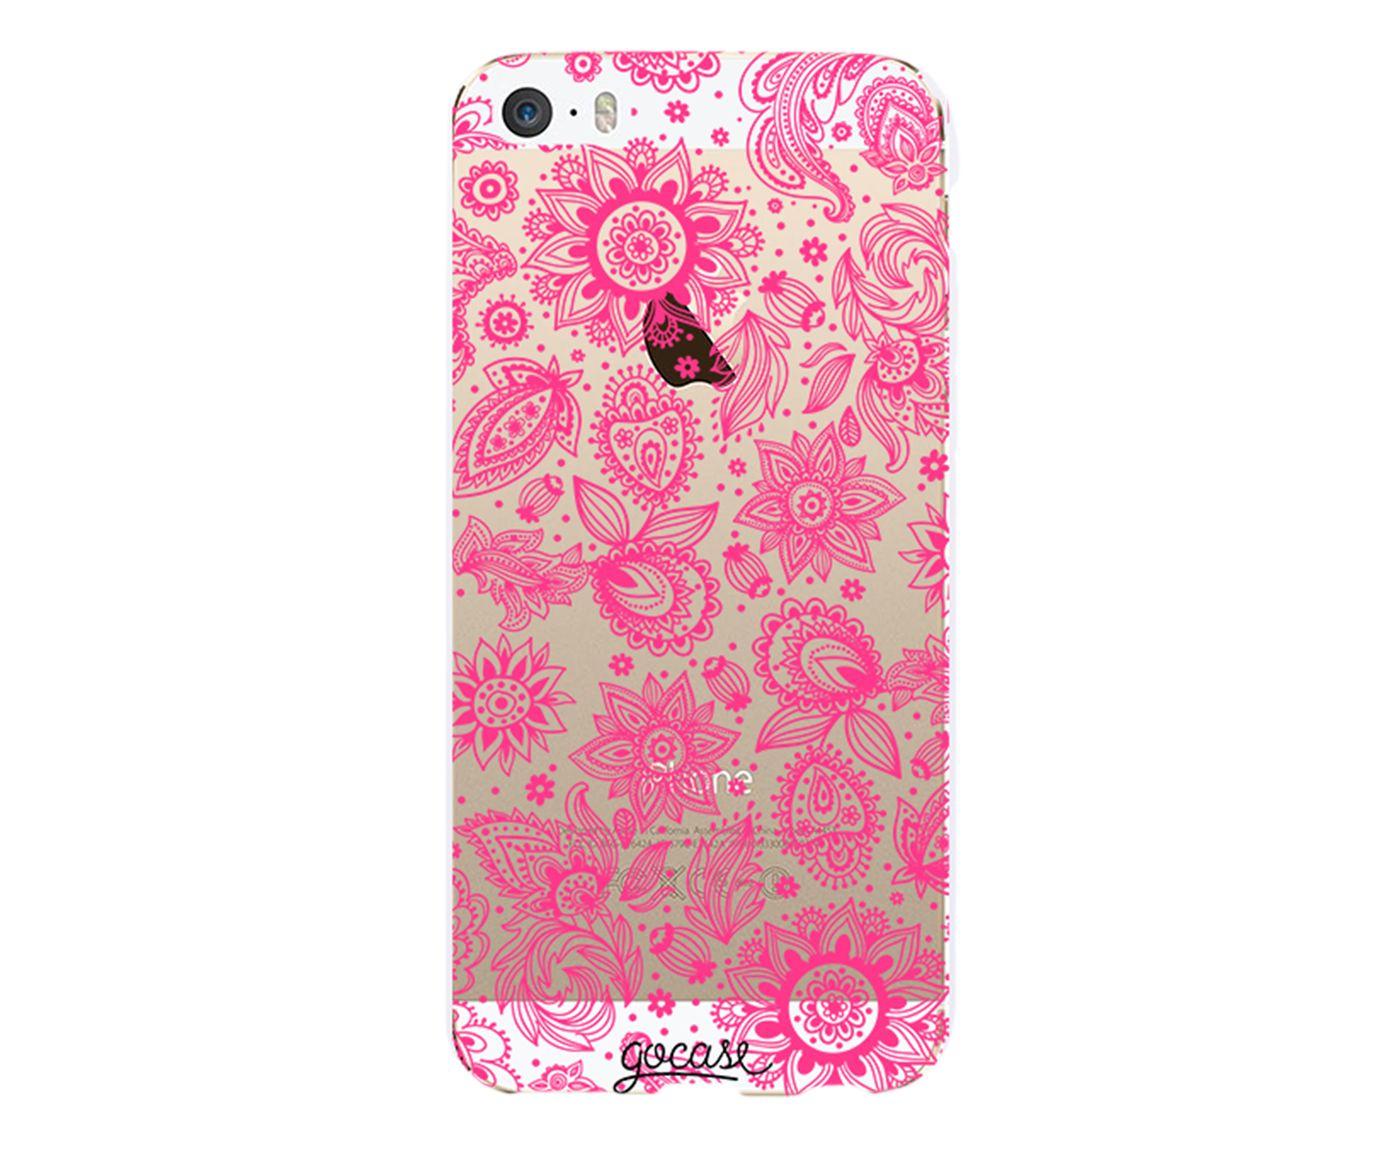 Case Renda Pink - Para iPhone 5C | Westwing.com.br